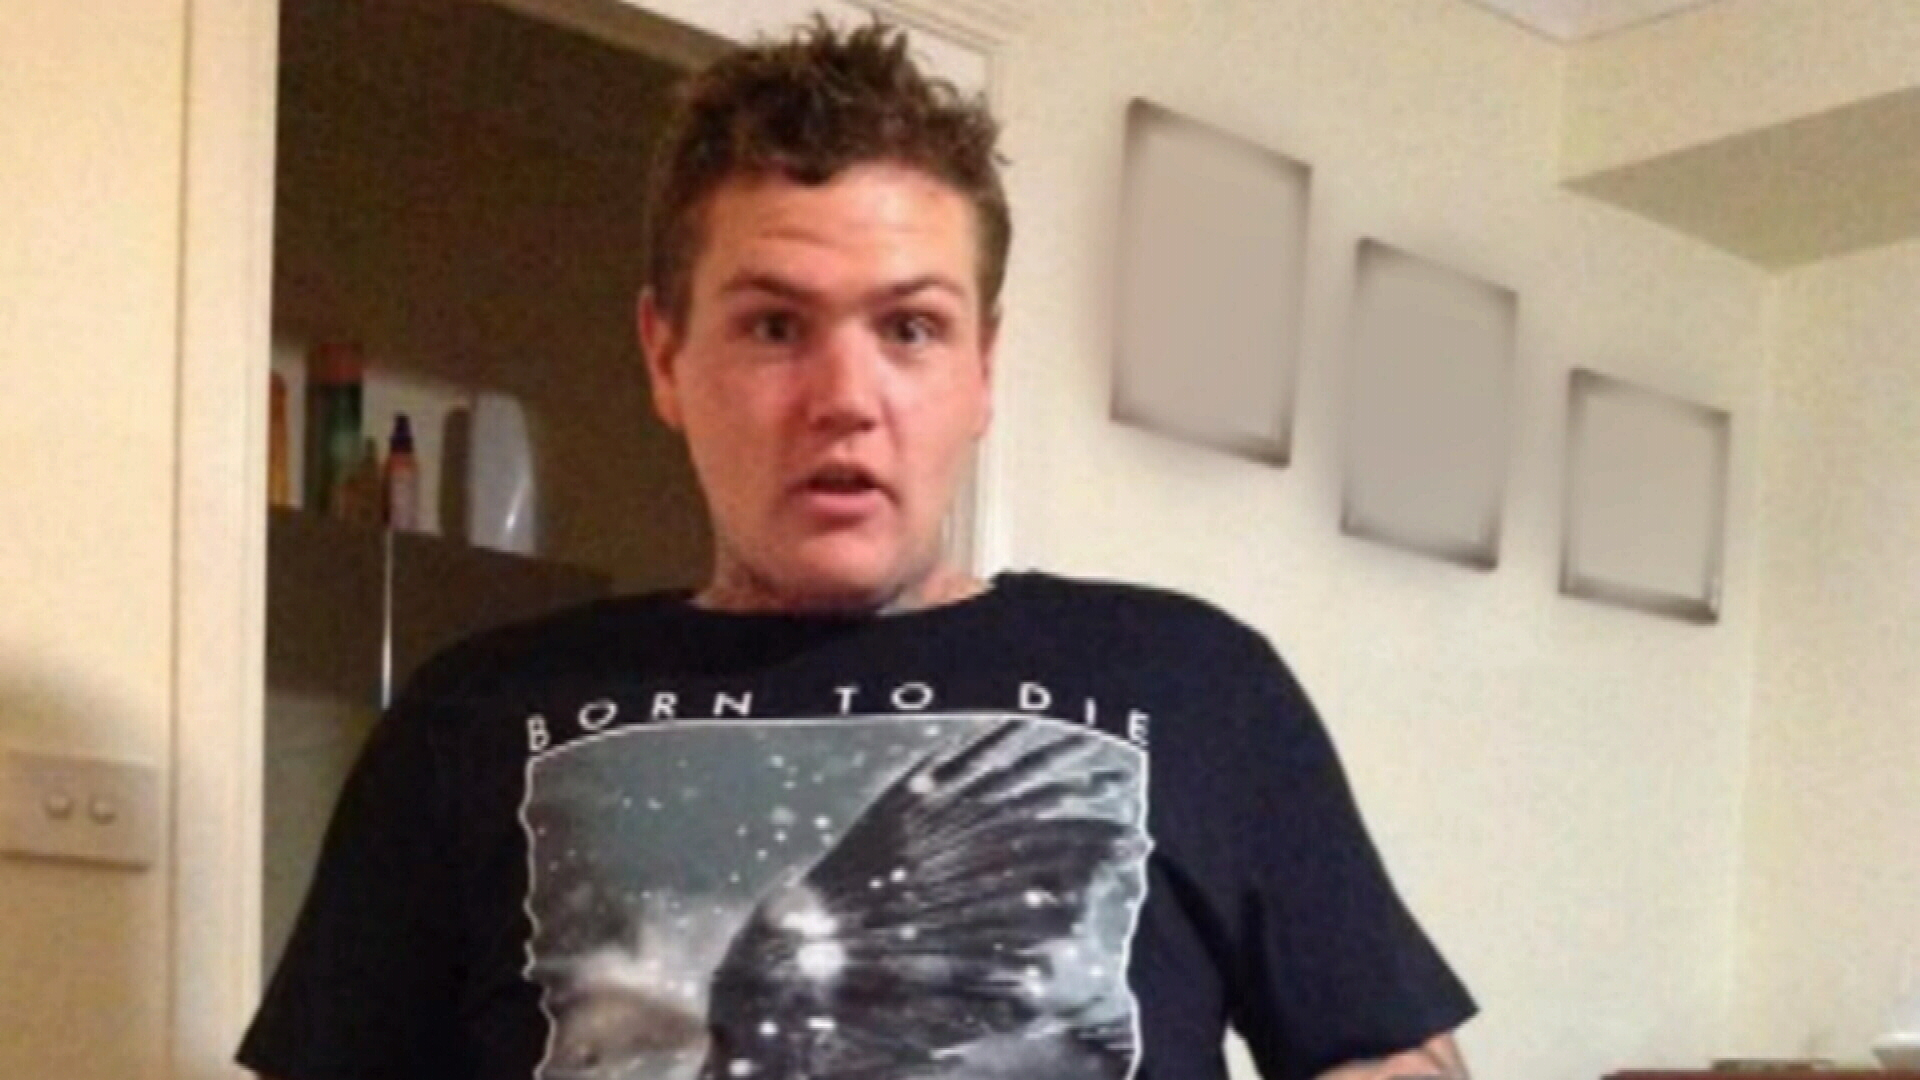 Sydney toddler attacker sentenced to jail